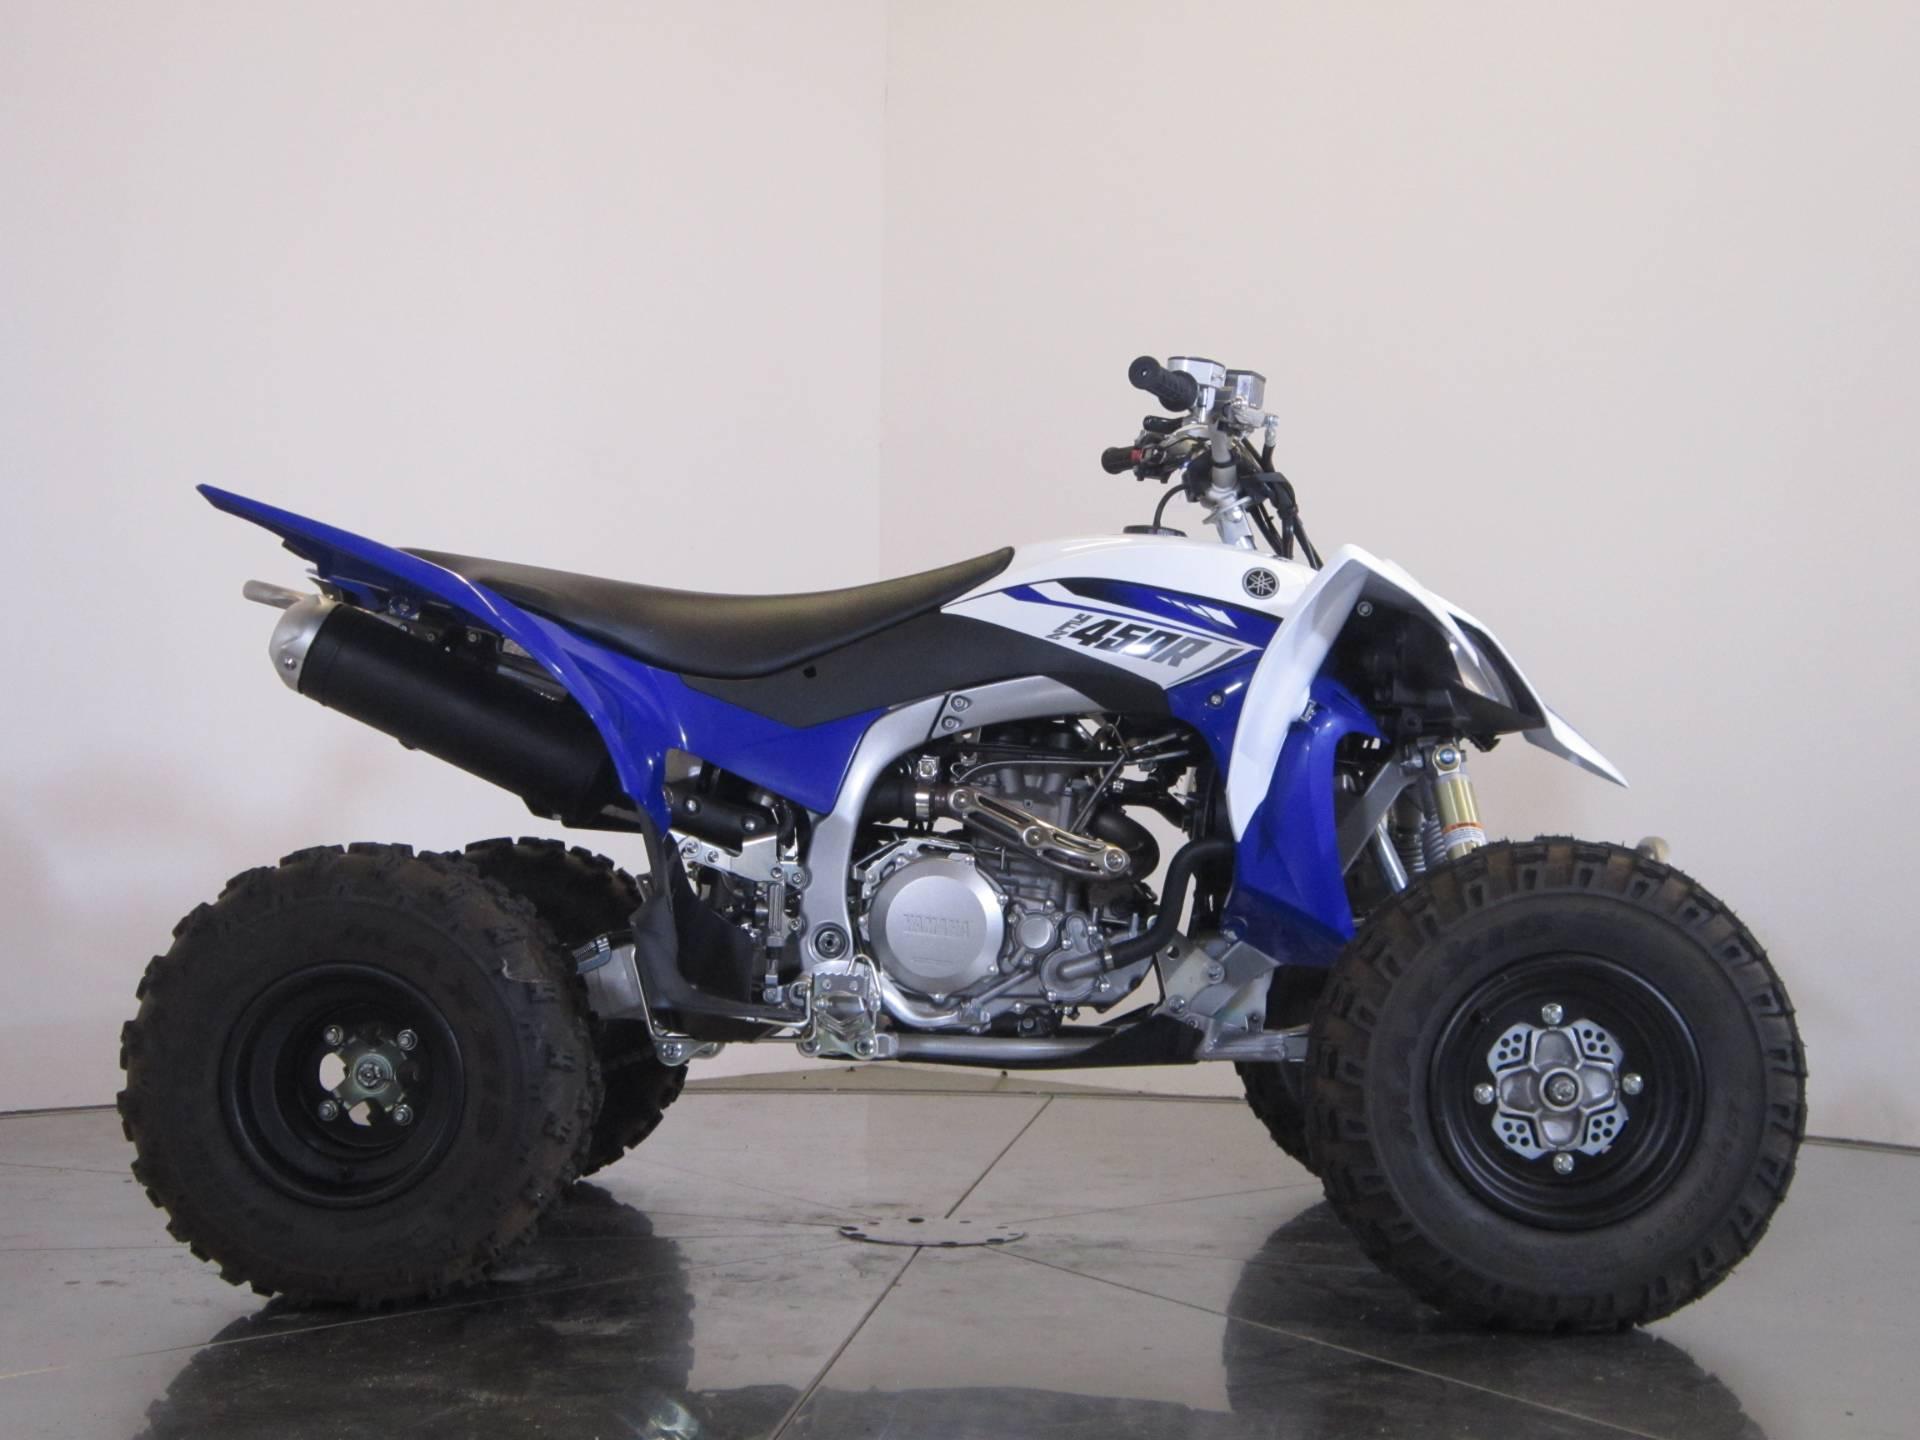 2014 Yamaha YFZ450R for sale 244239